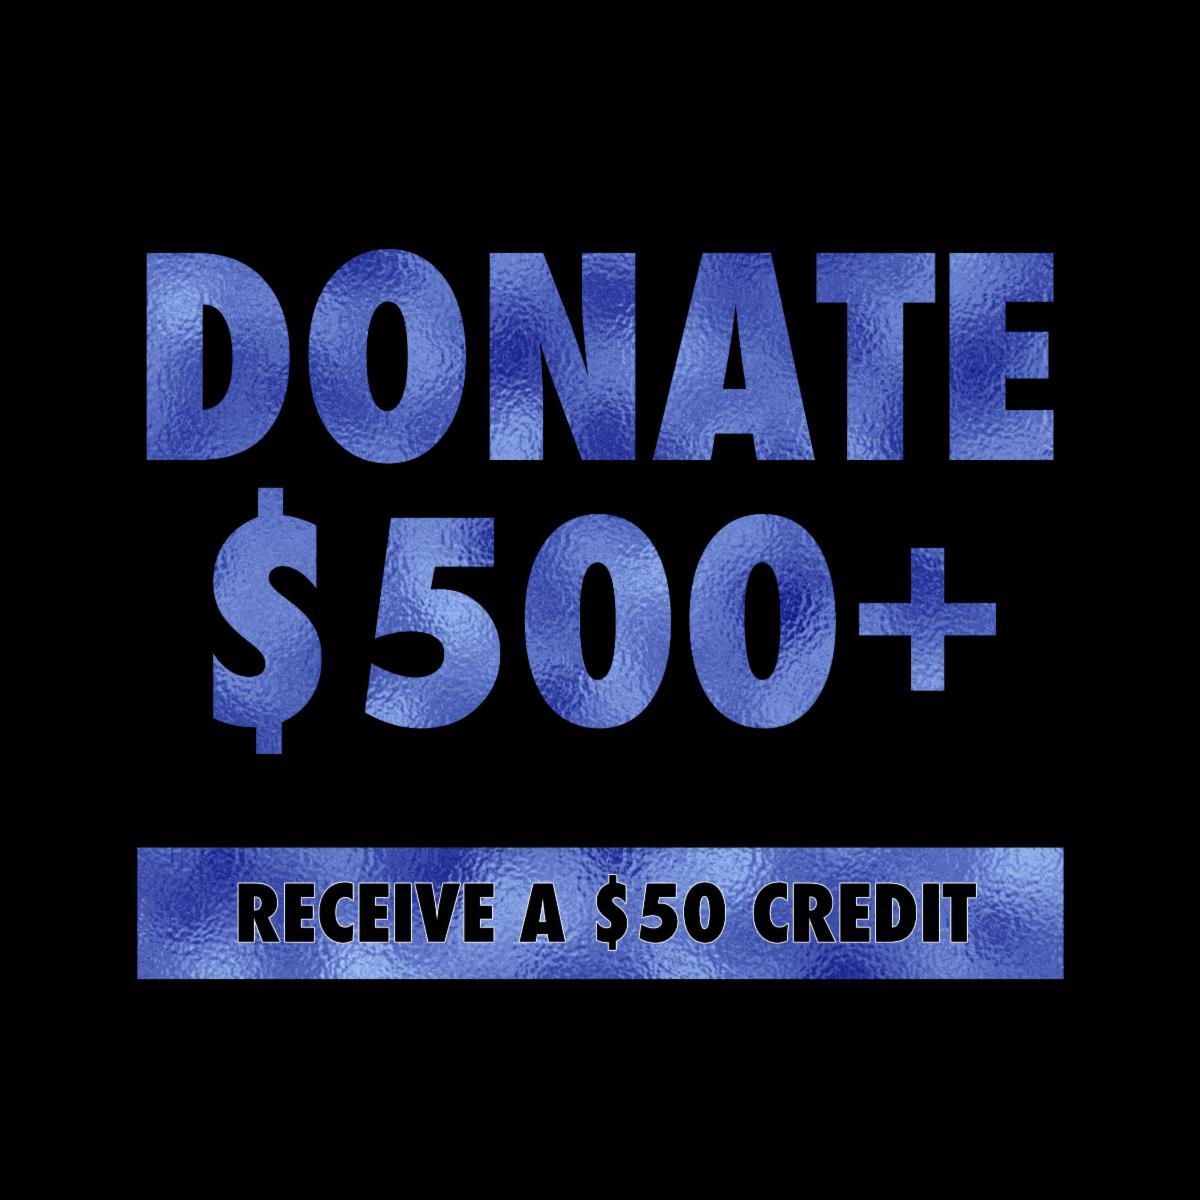 Donate $500 Receive $50